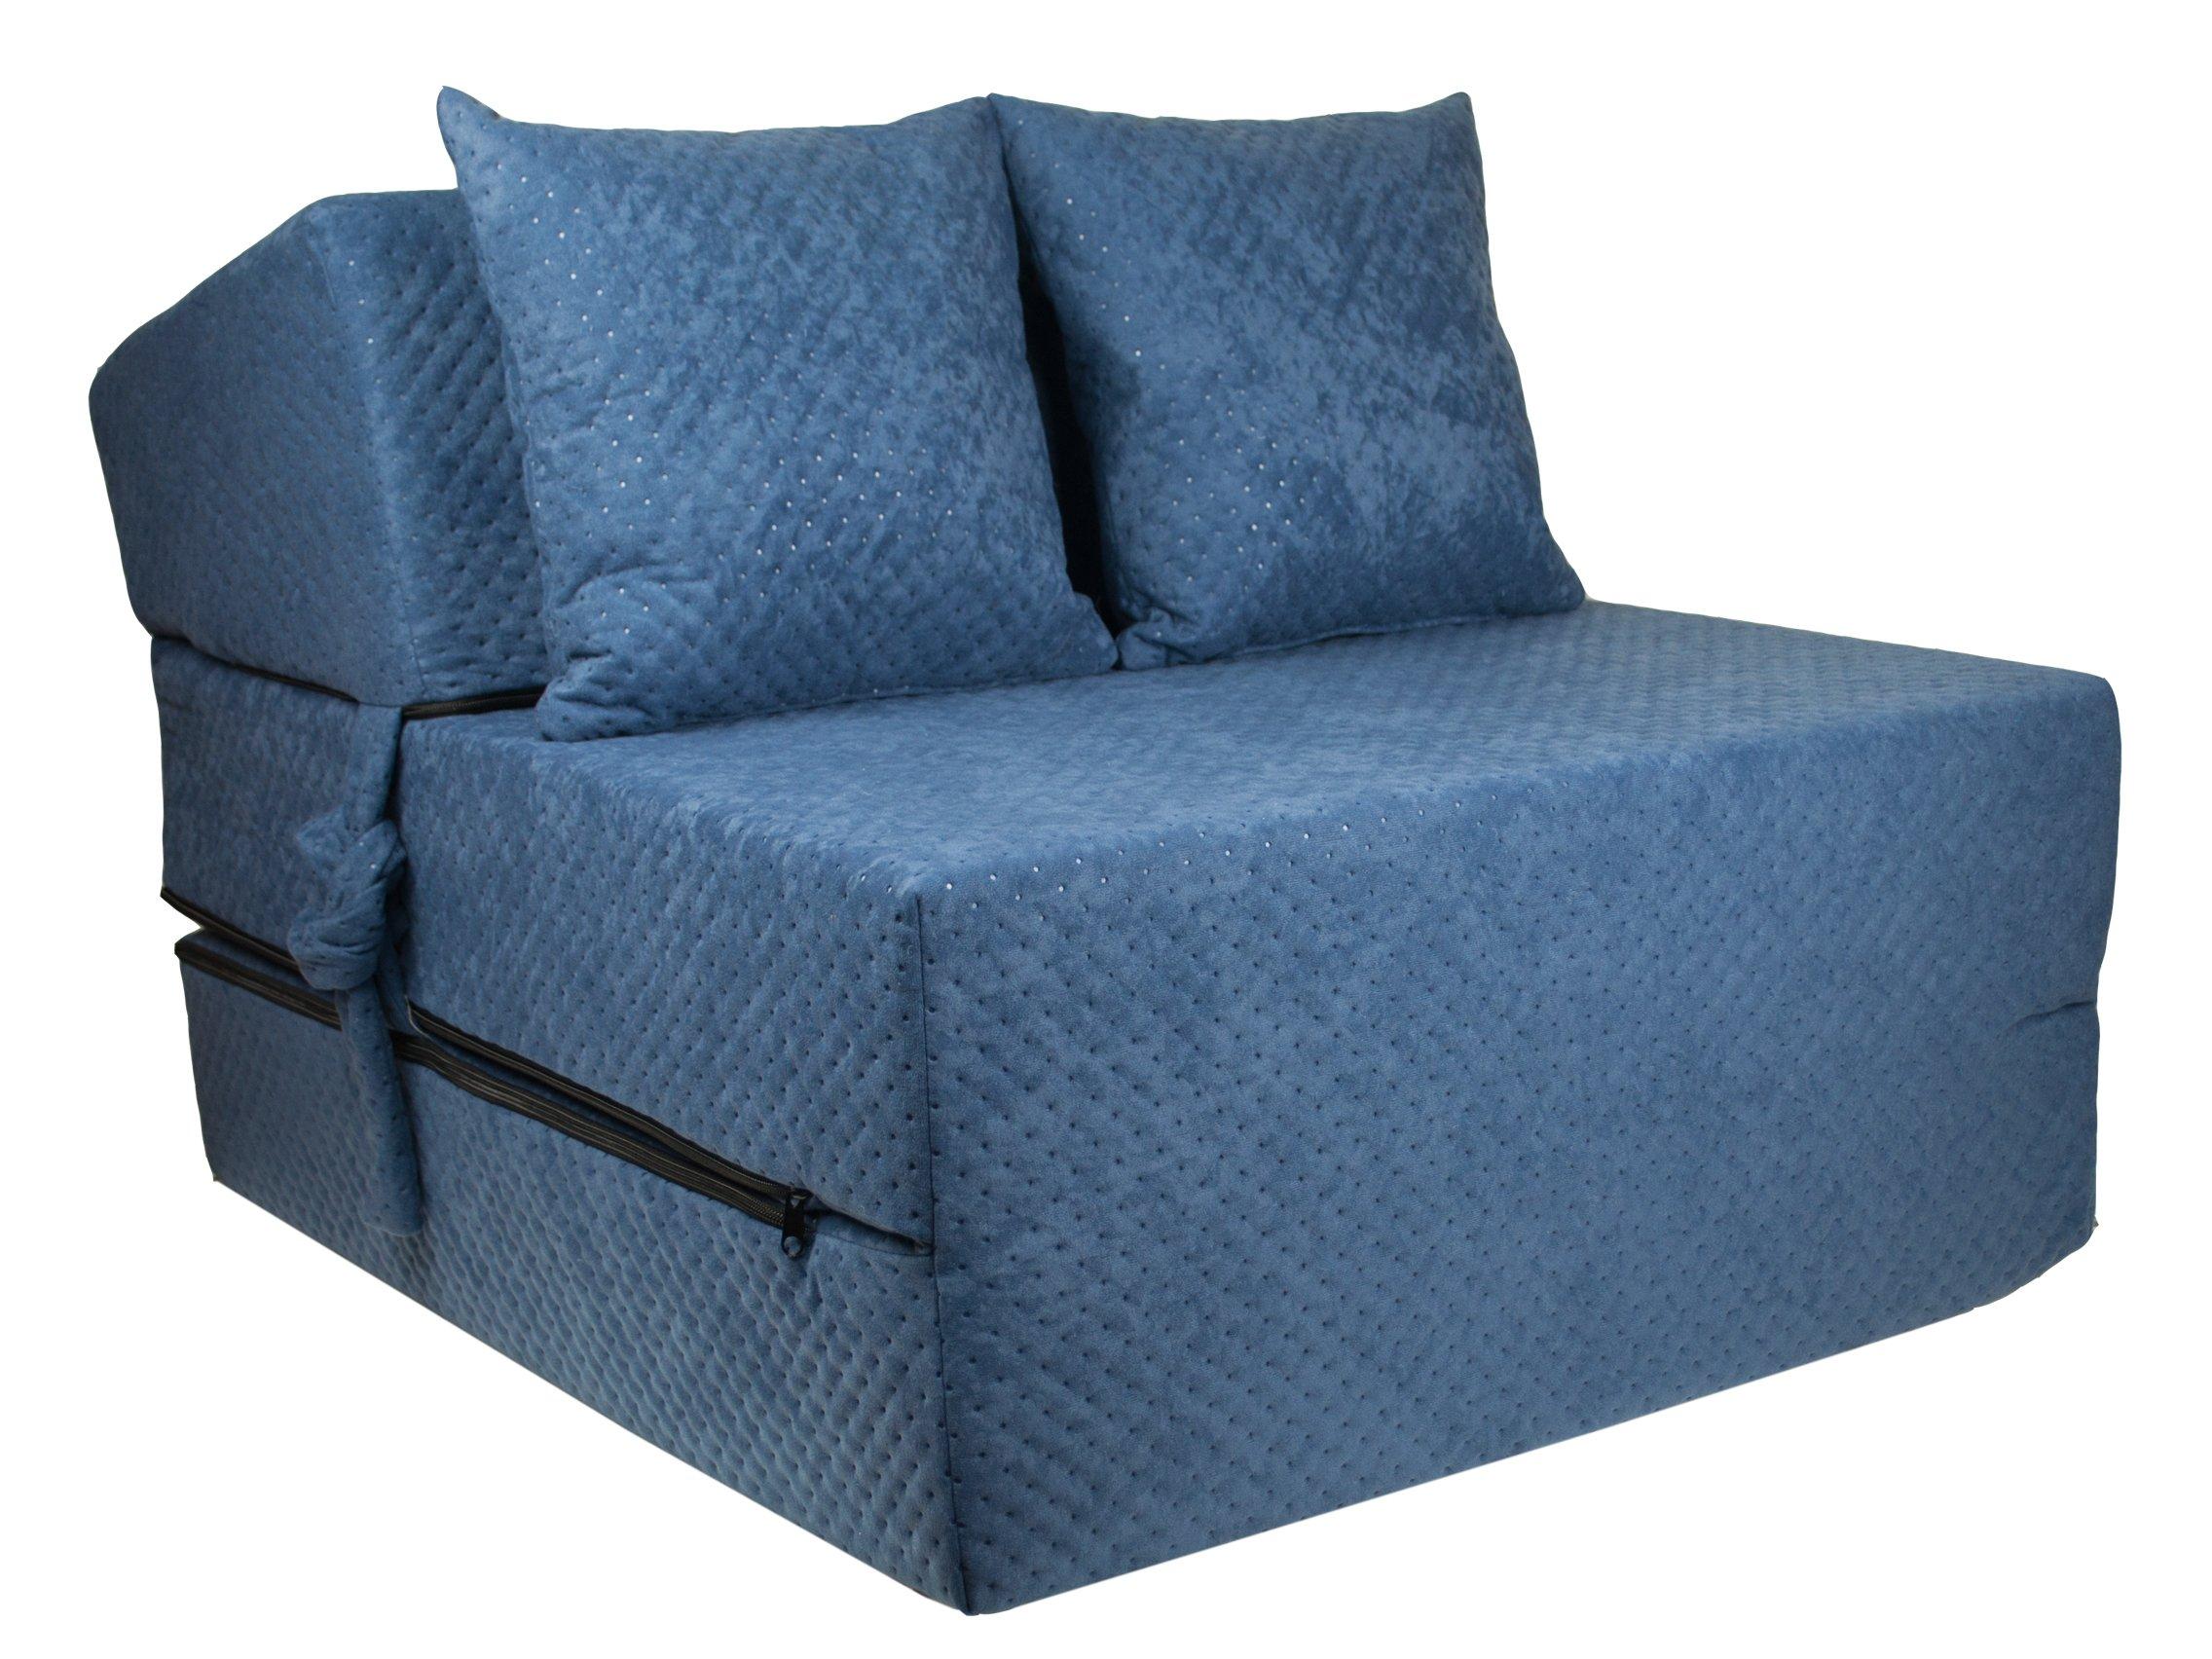 FIMEX Kreslo SUPER Comfort 70x200x15 Tmavě modrá